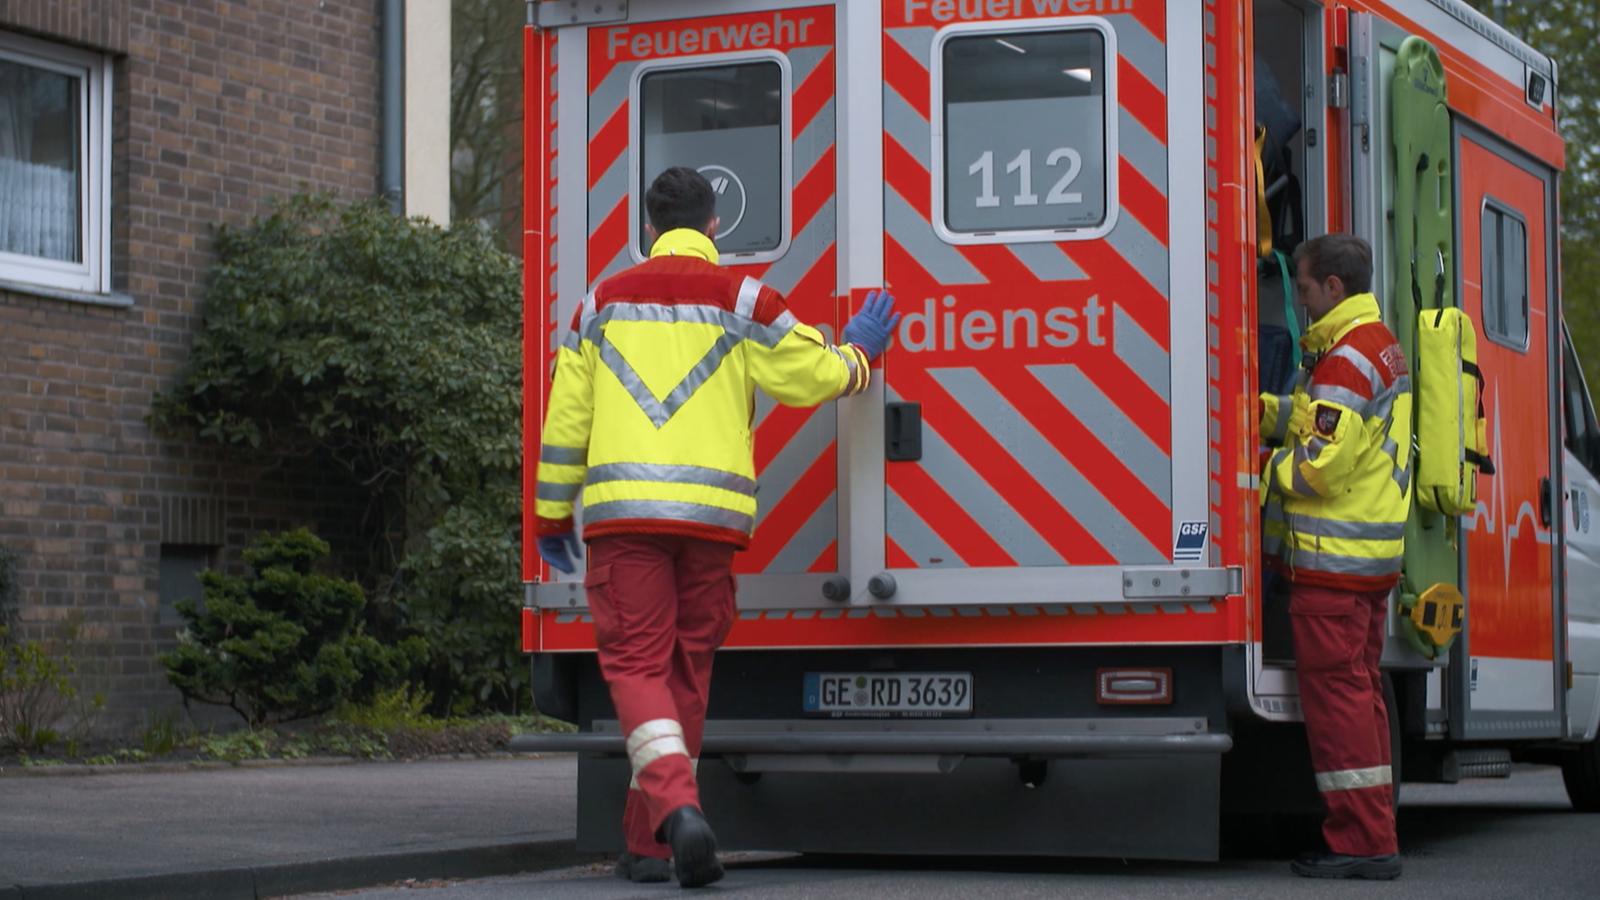 Bochum Wdr Doku Feuer Und Flamme Lauft Ab 23 Marz Wp De